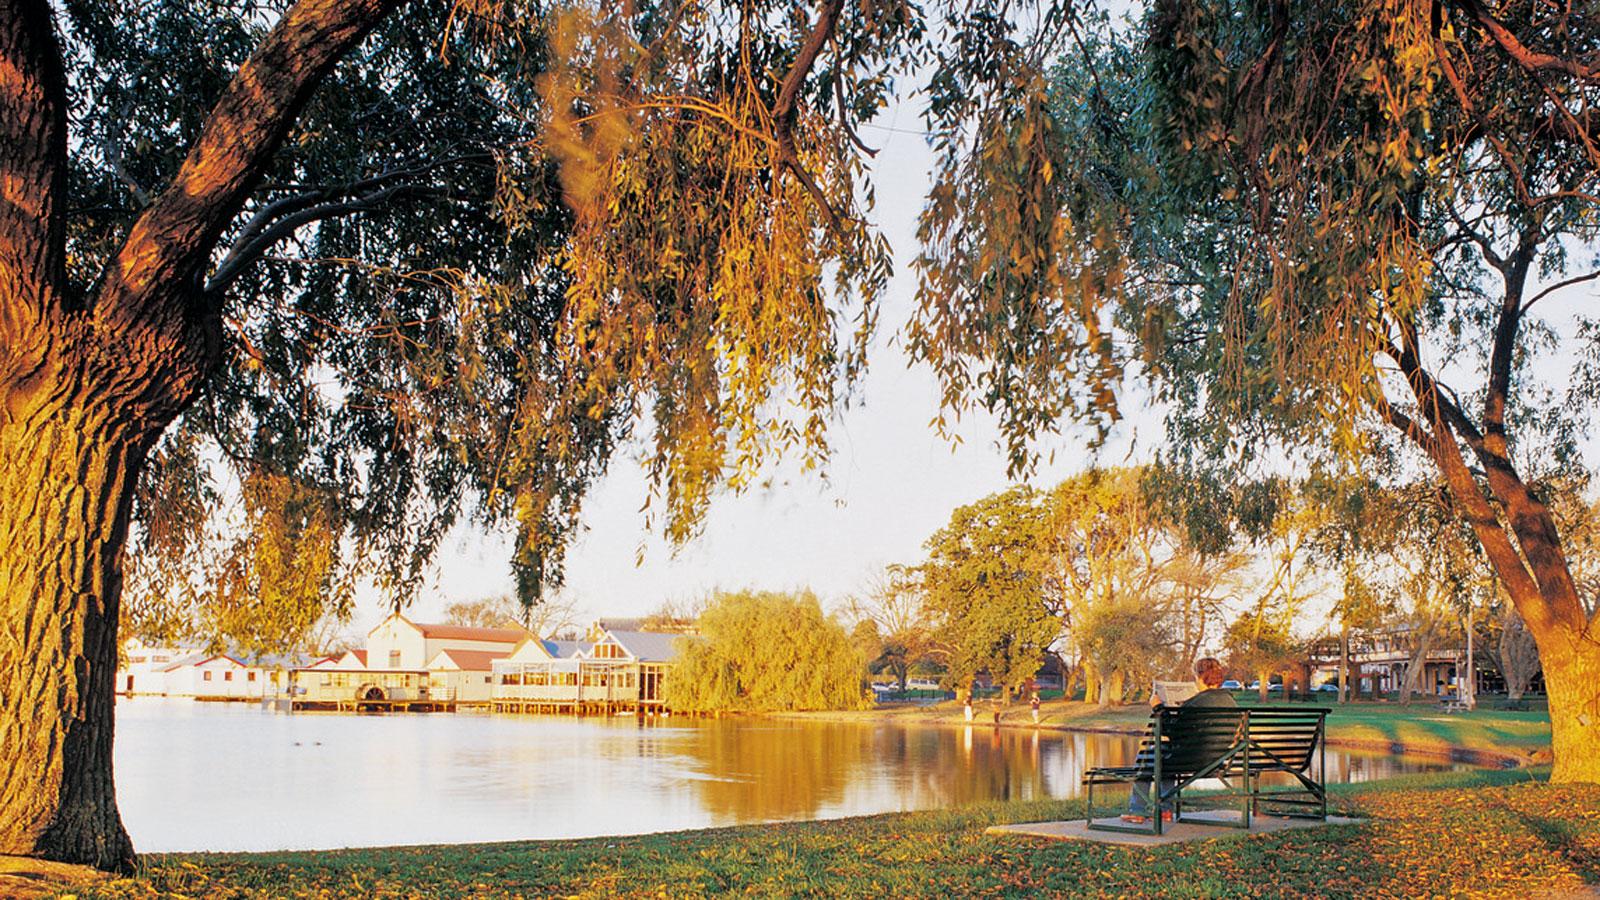 Lake Wendouree, Ballarat, Goldfields, Victoria, Australia